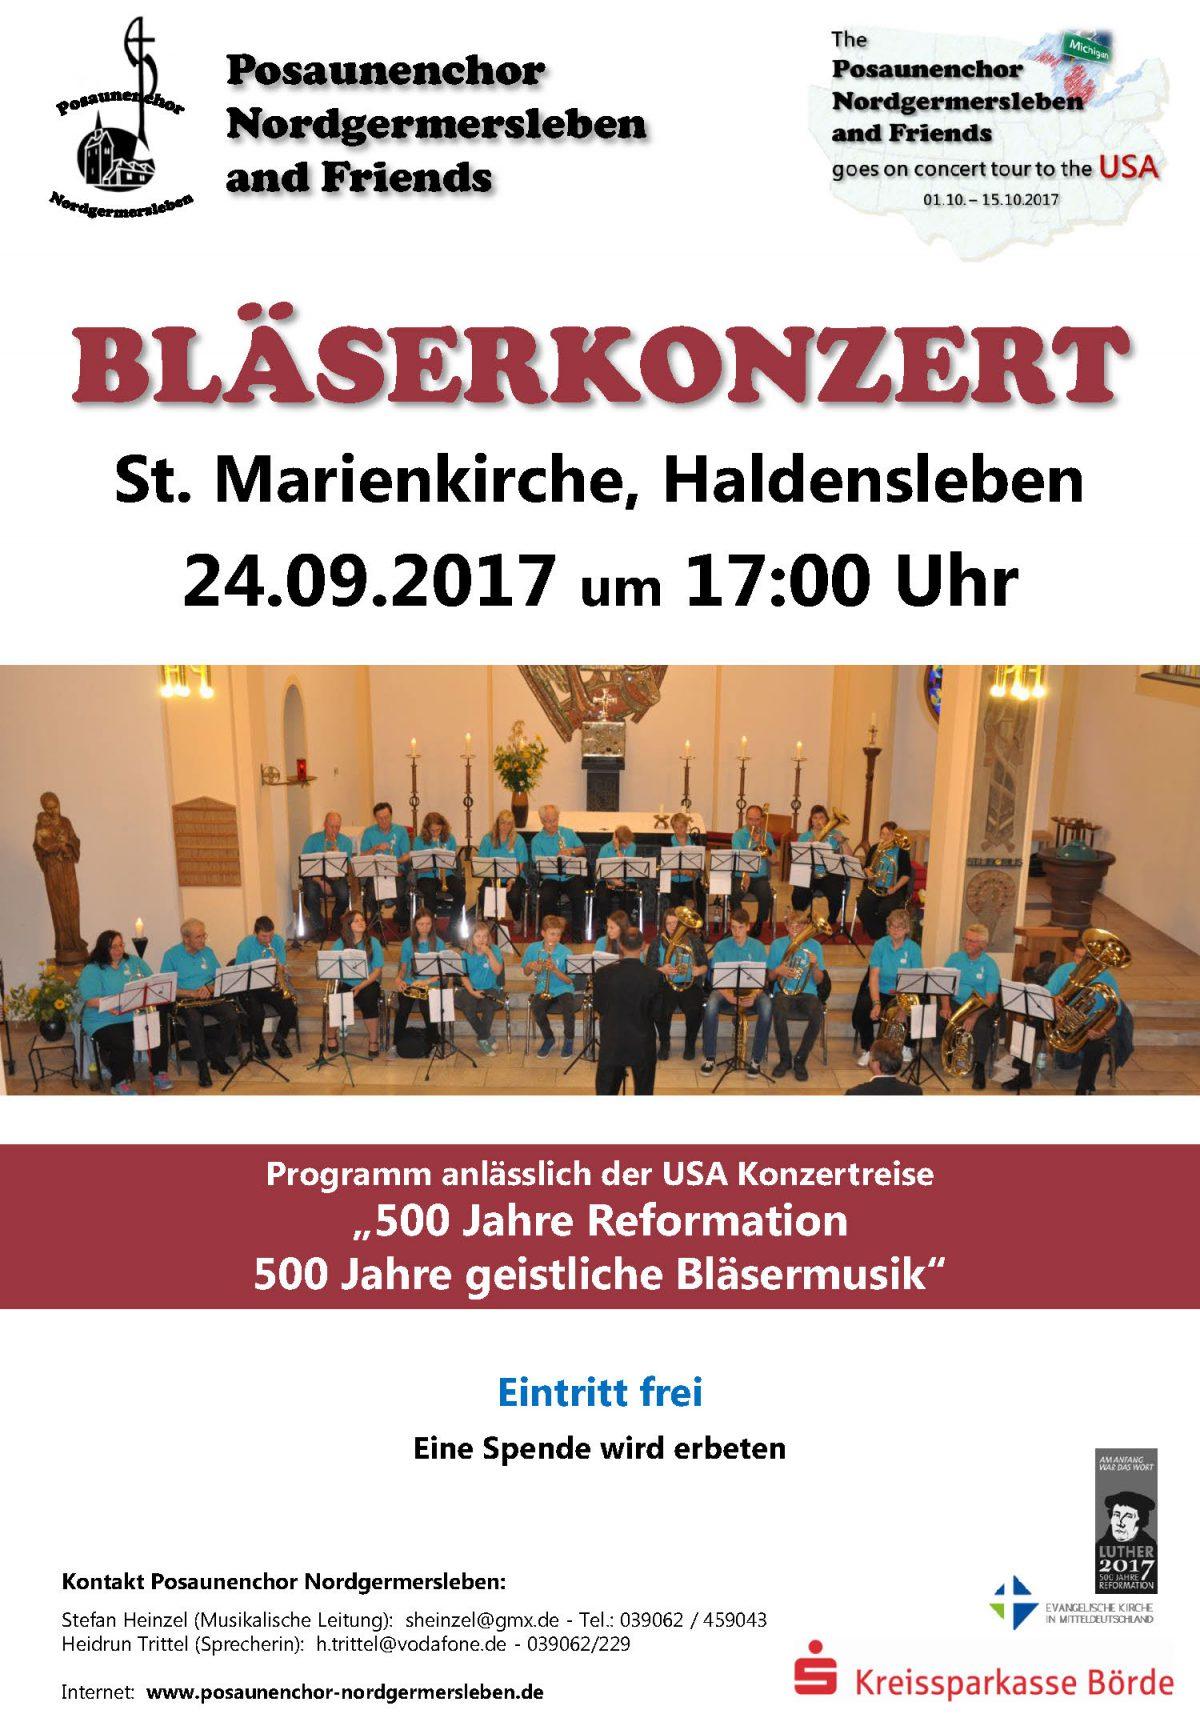 Konzert 24.09.17, 17.00 Uhr, St. Marien